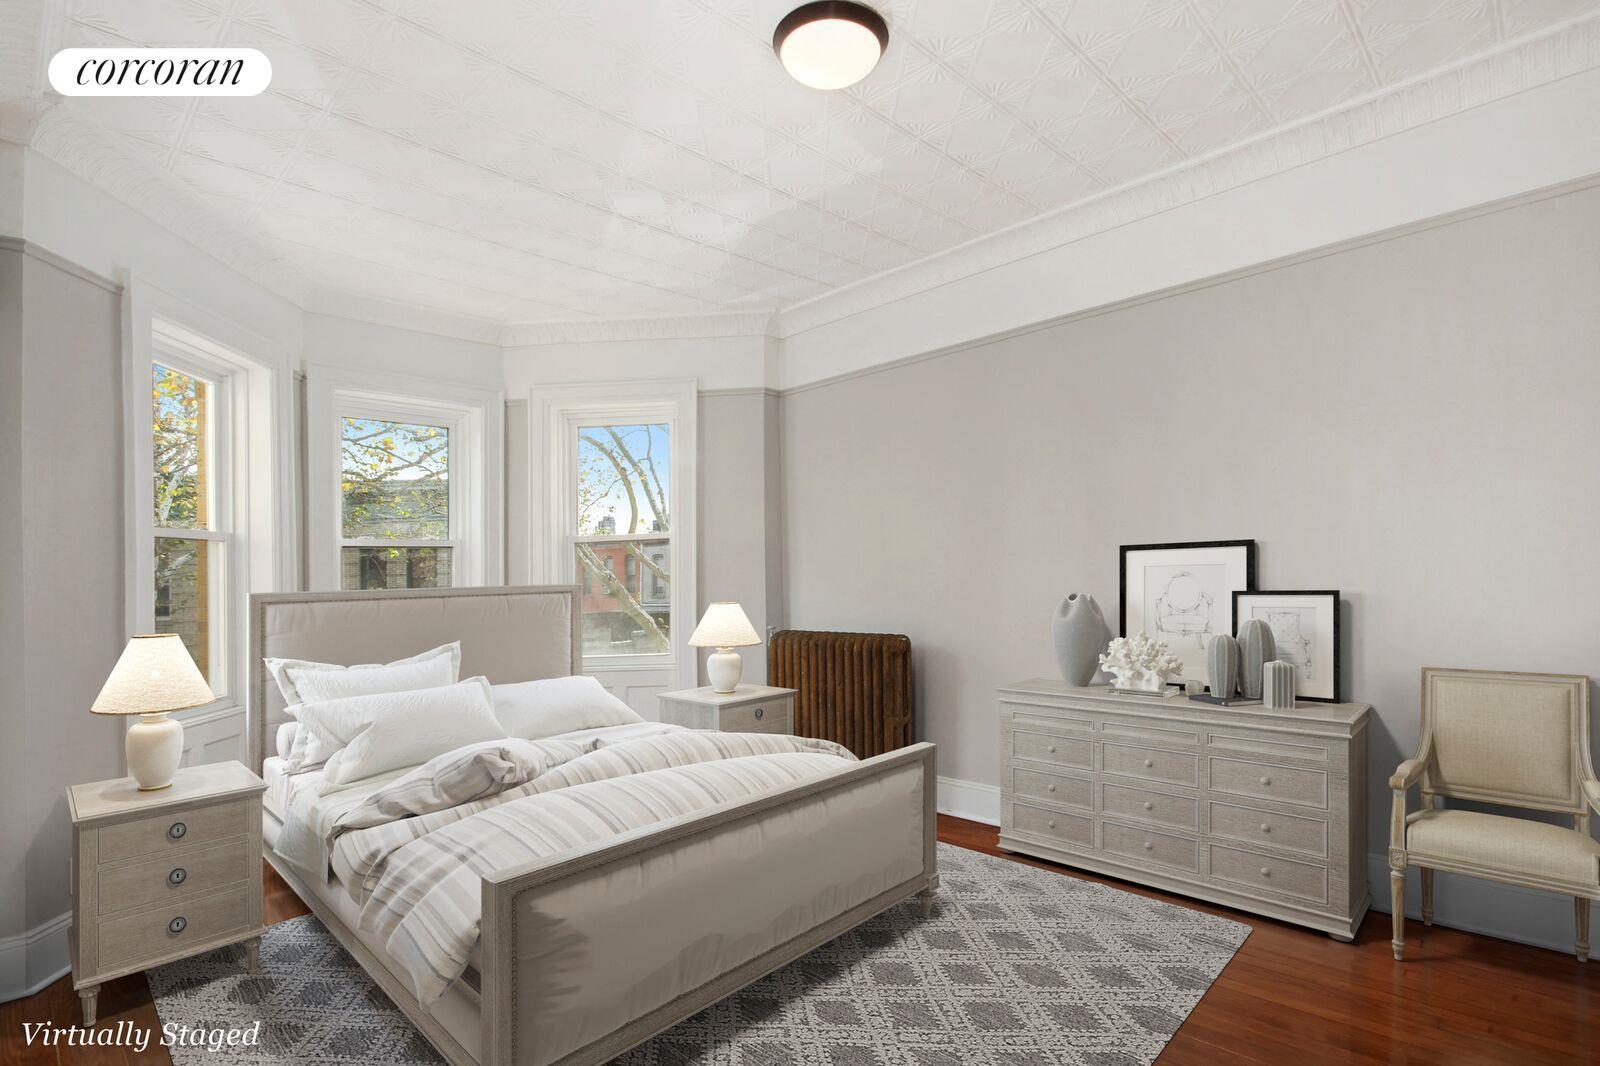 Multi-Family Home for Sale at 1489 Putnam Avenue 1489 Putnam Avenue Brooklyn, New York 11237 United States